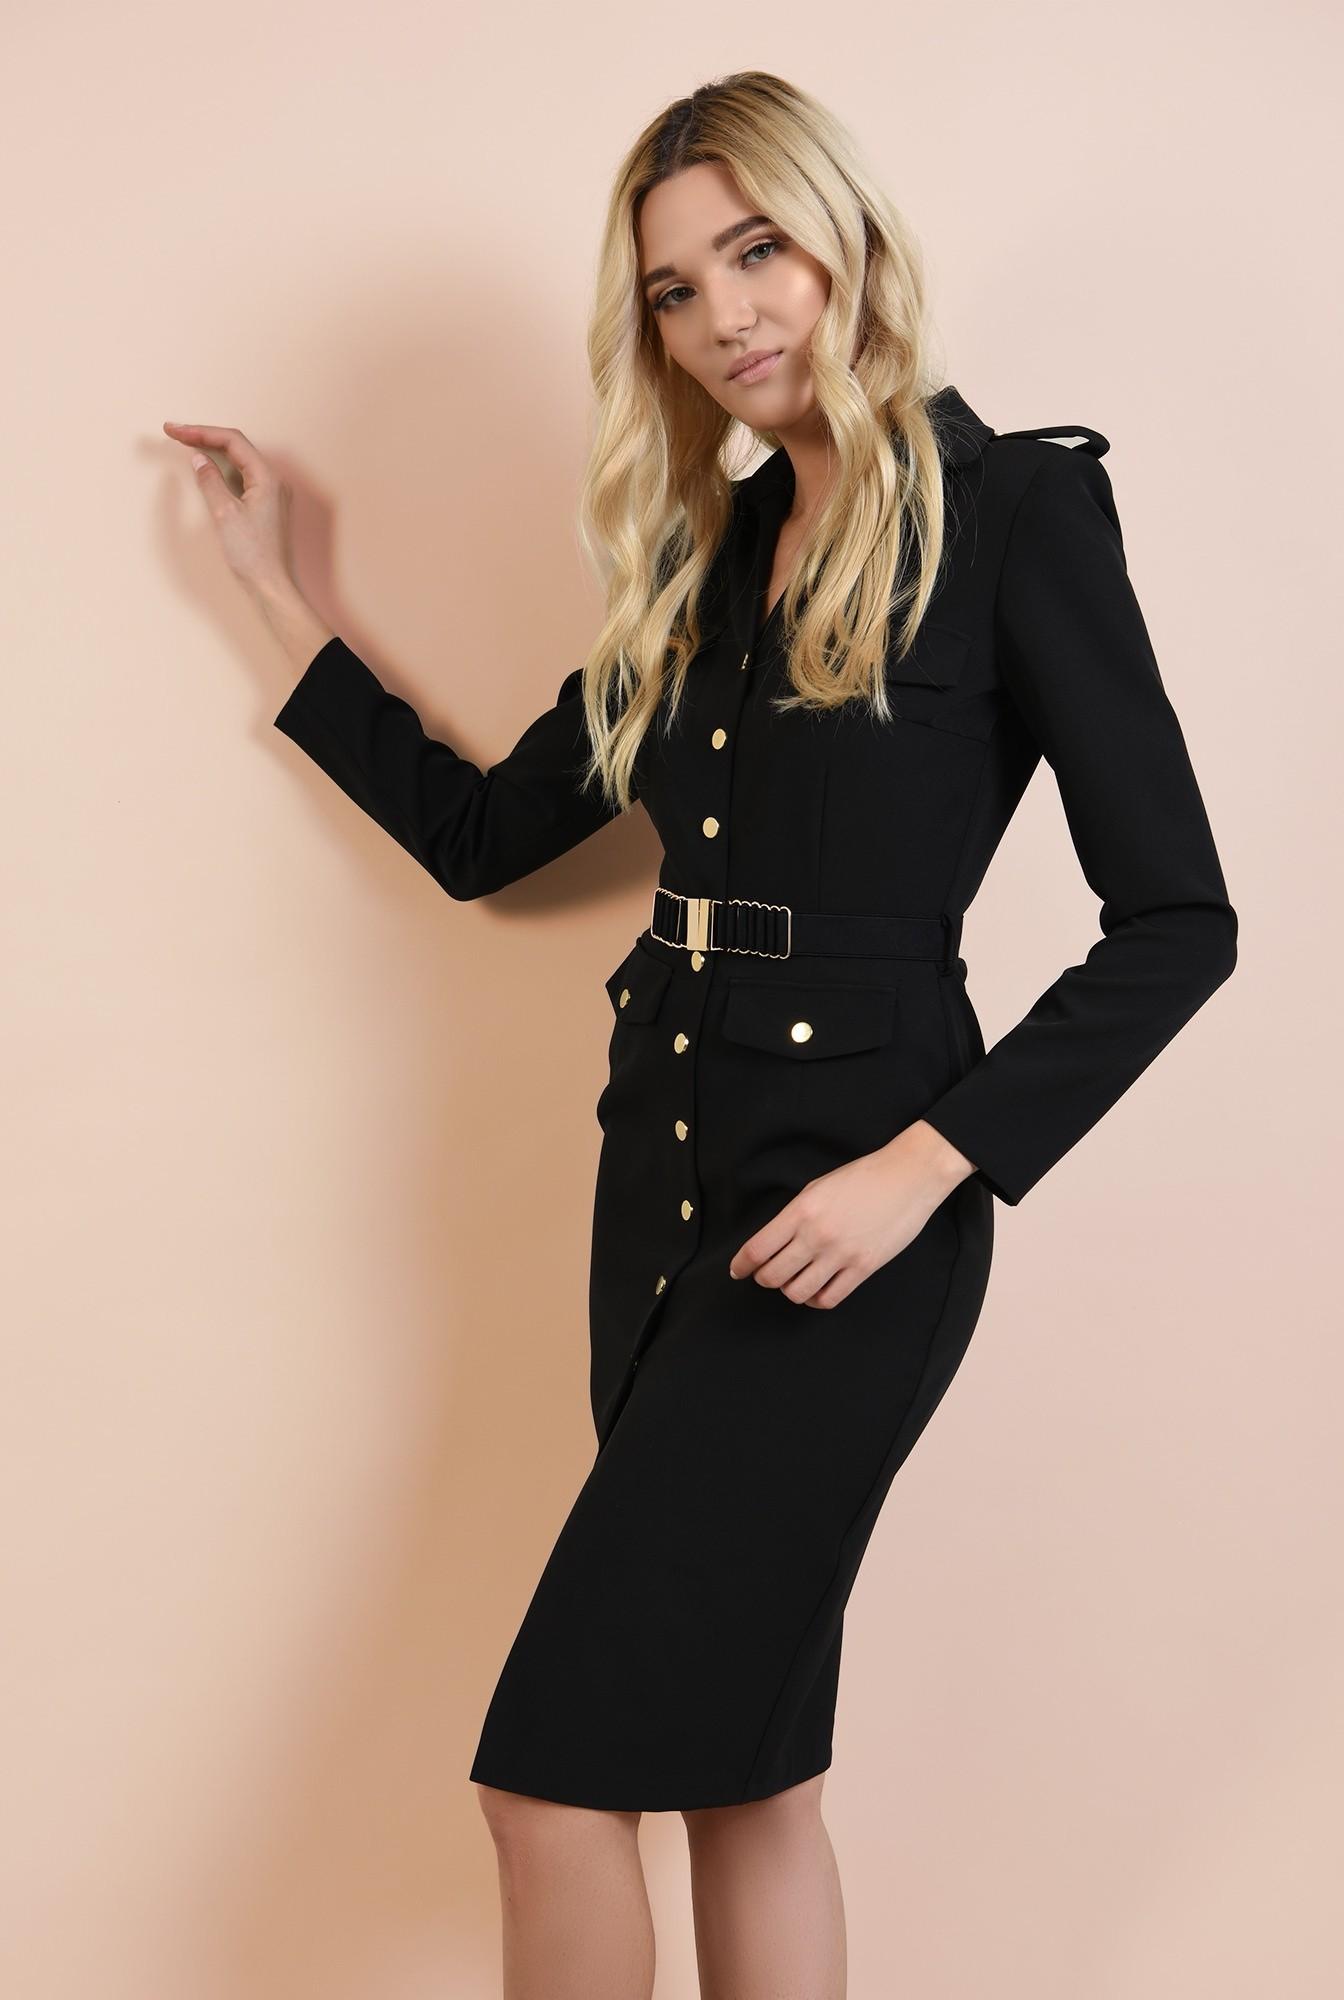 0 - rochie neagra, casual, nasturi aurii, epoleti, curea fronsata